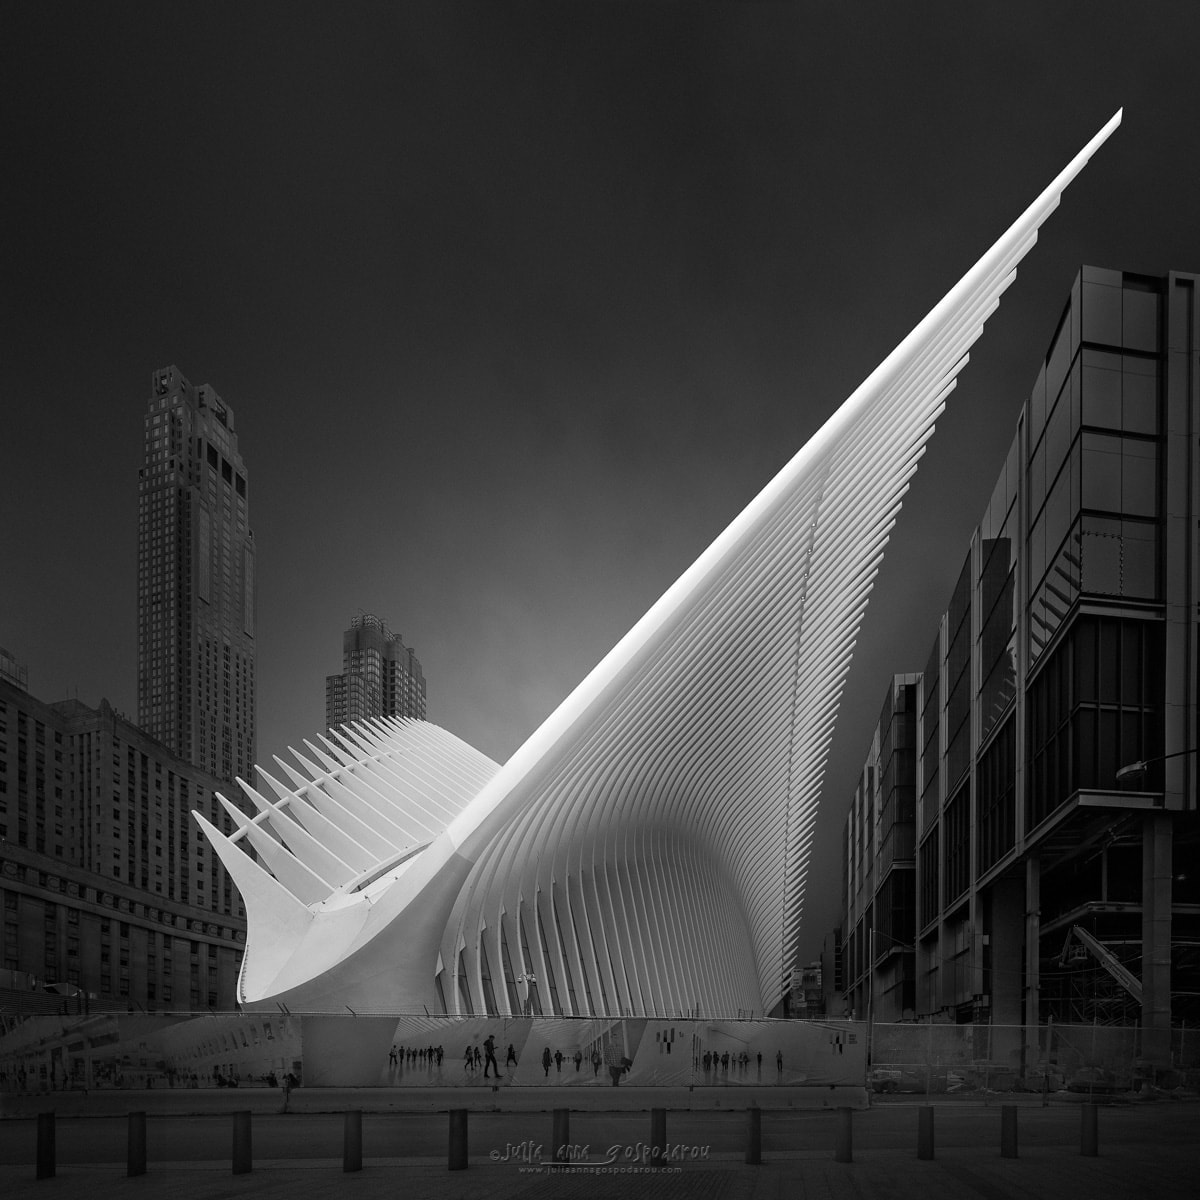 Julia Anna Gospodarou - Flying Away IV - New York - long exposure photography in an urban environment